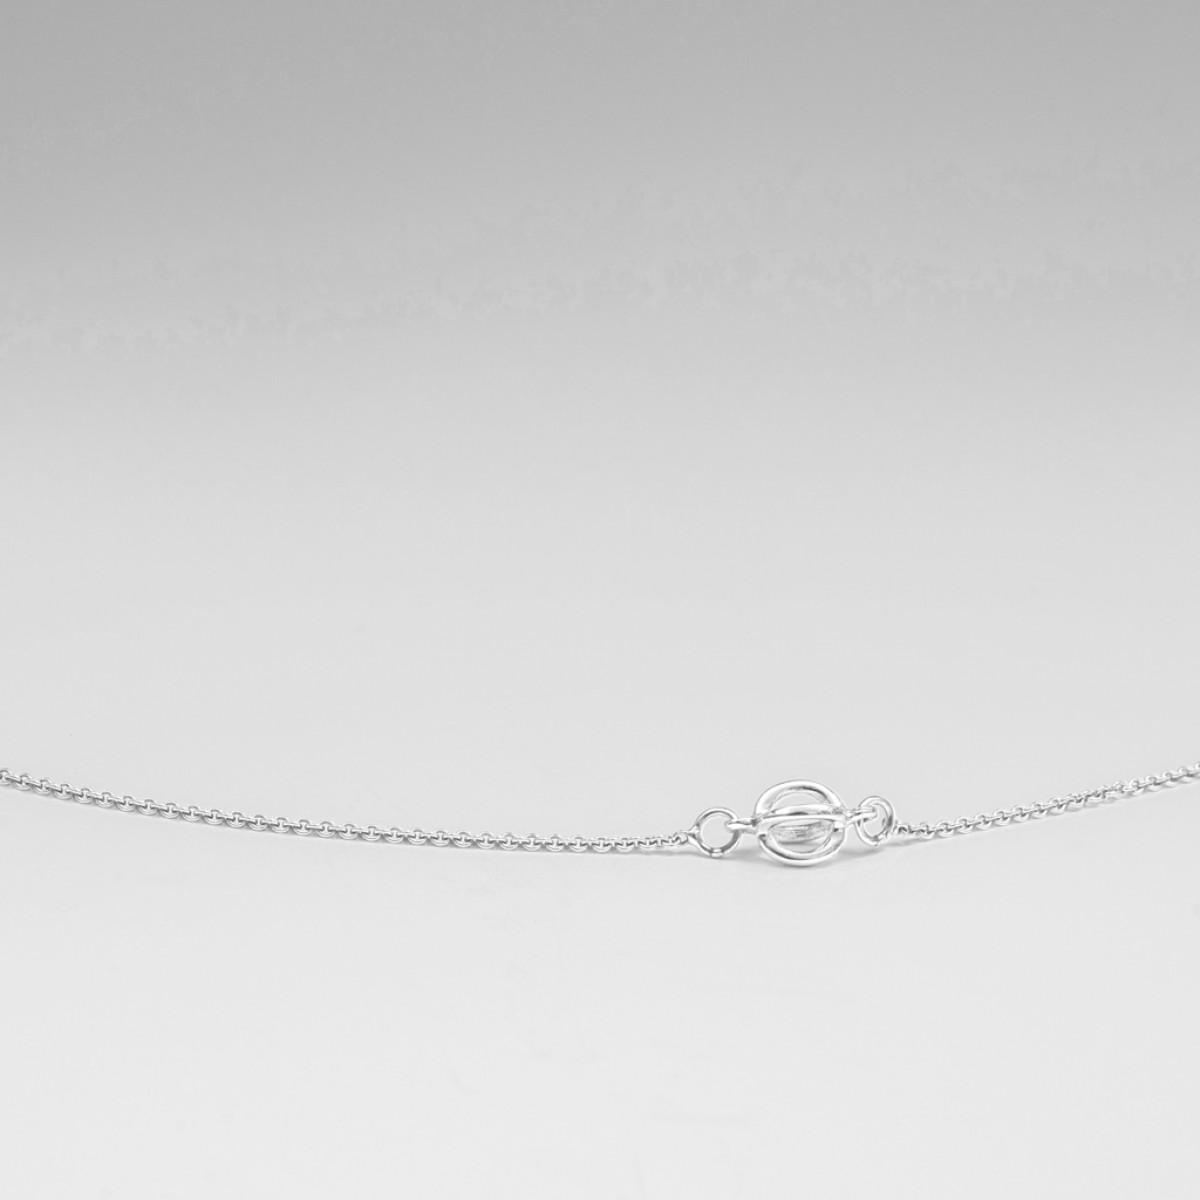 Jonathan Radetz Jewellery, Kette KISSKISS ONE, Länge 43cm Silber 925